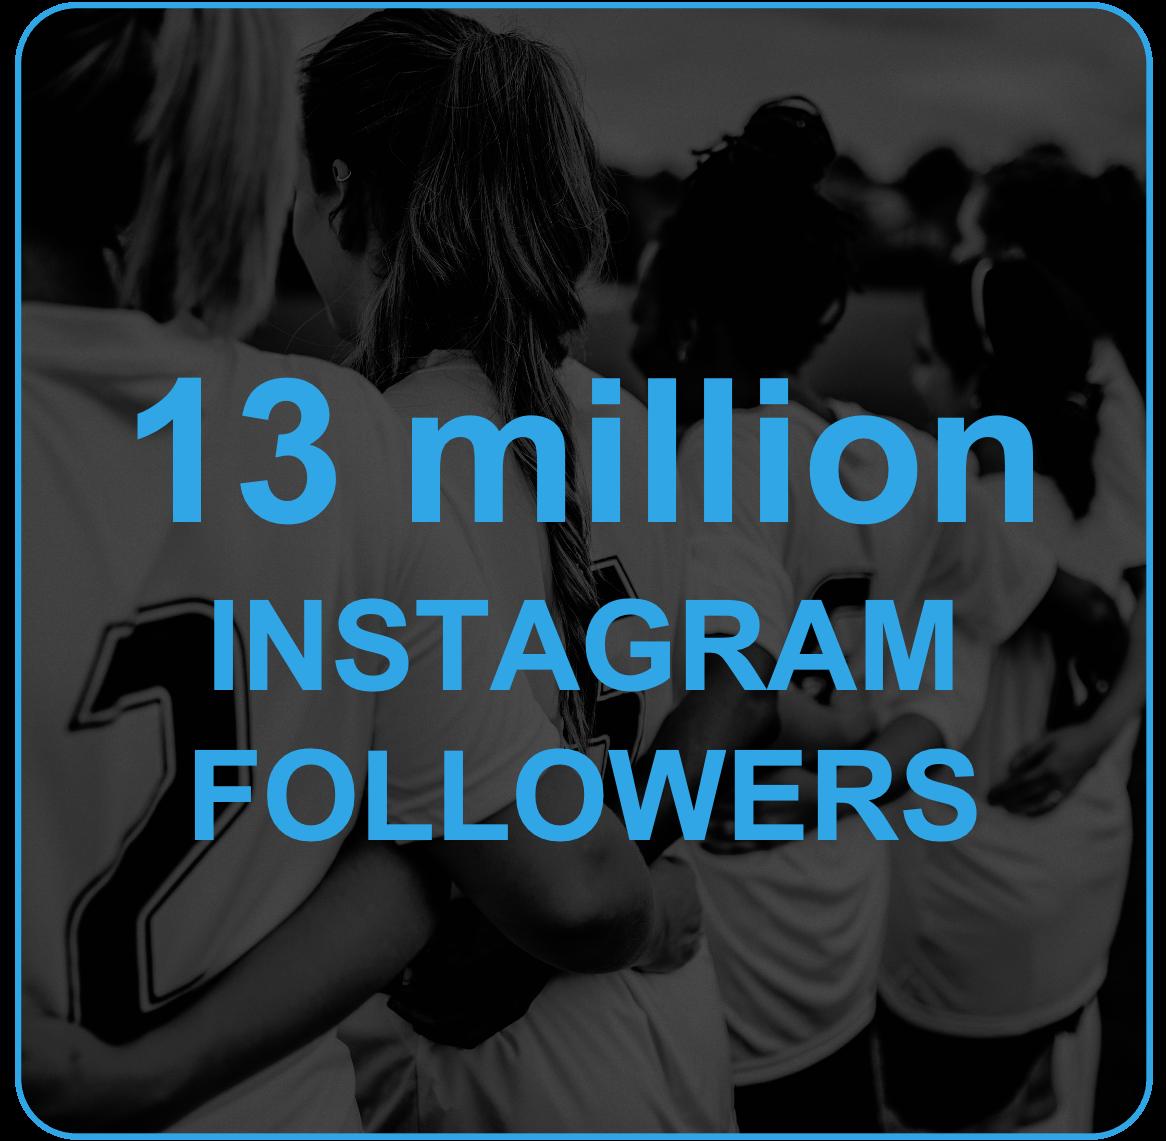 13 million instagram followers